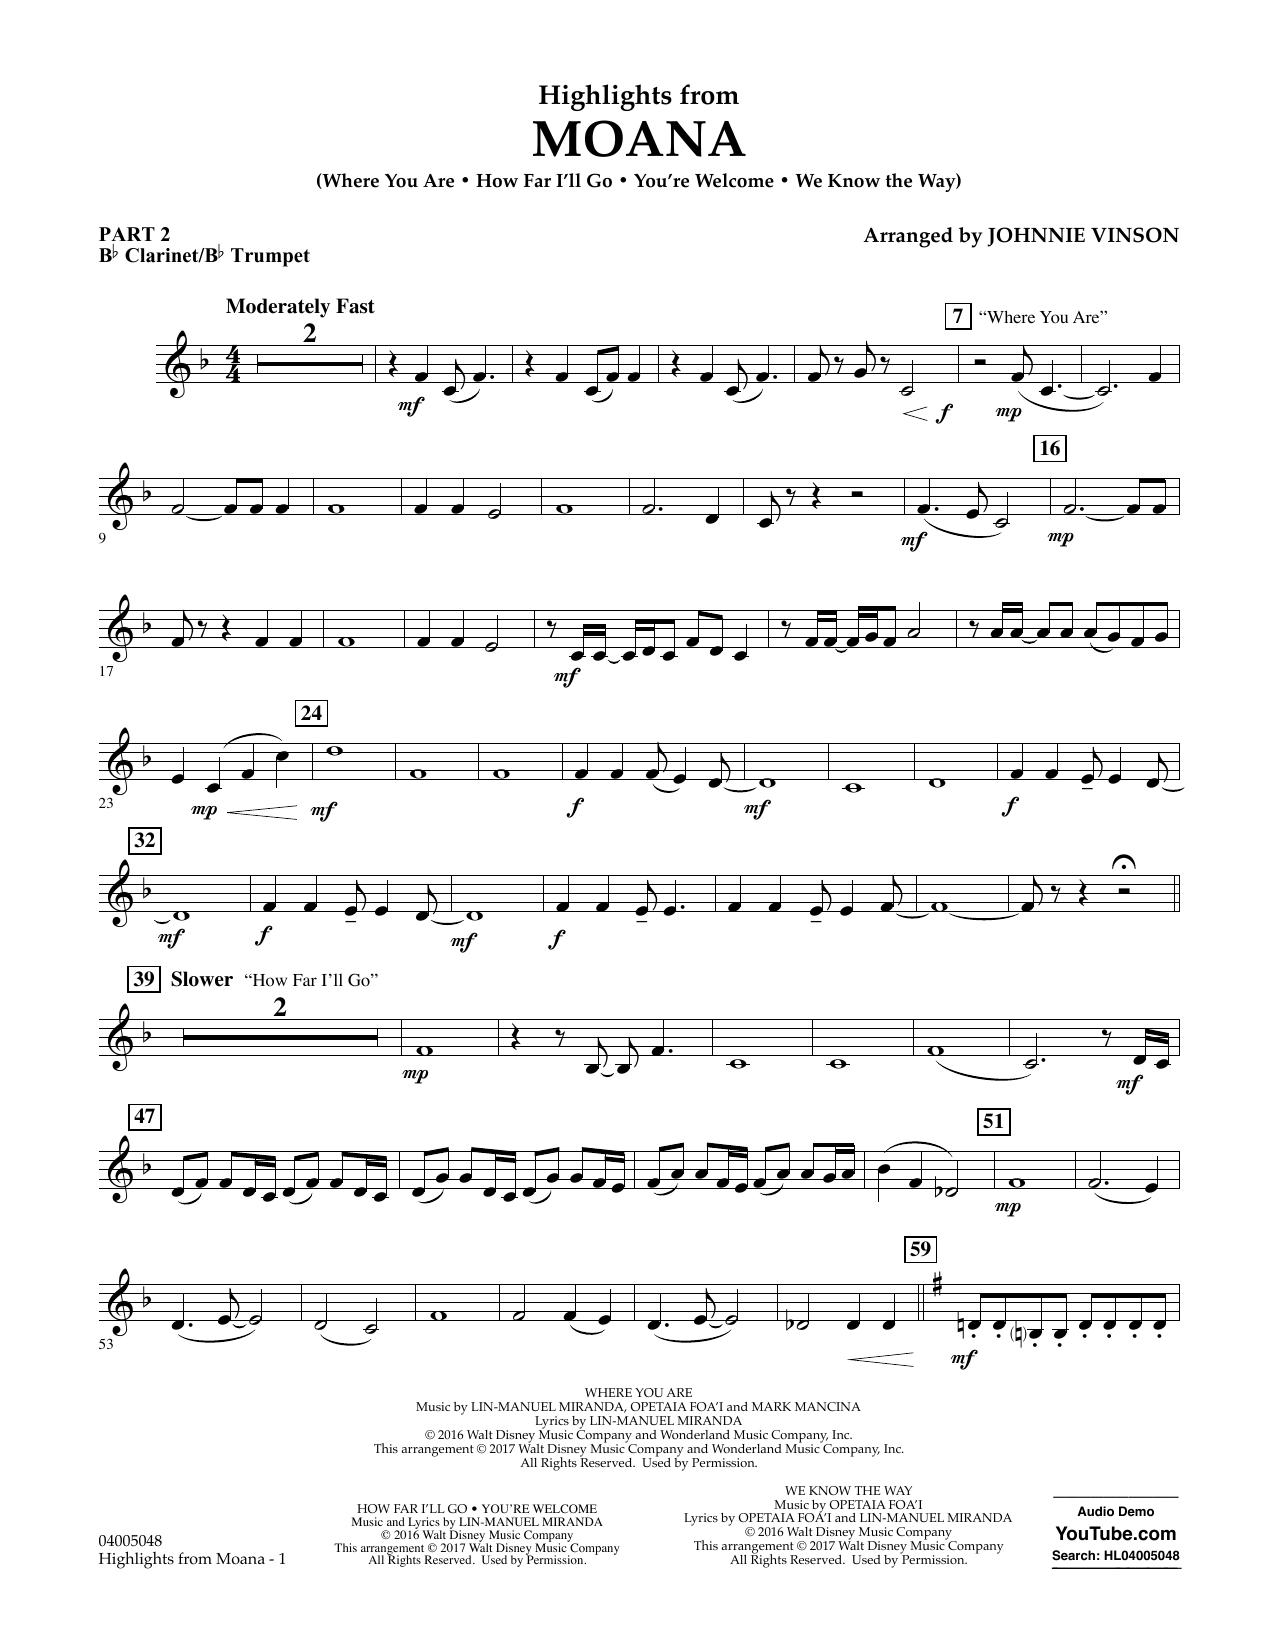 Highlights from Moana - Pt.2 - Bb Clarinet/Bb Trumpet Sheet Music